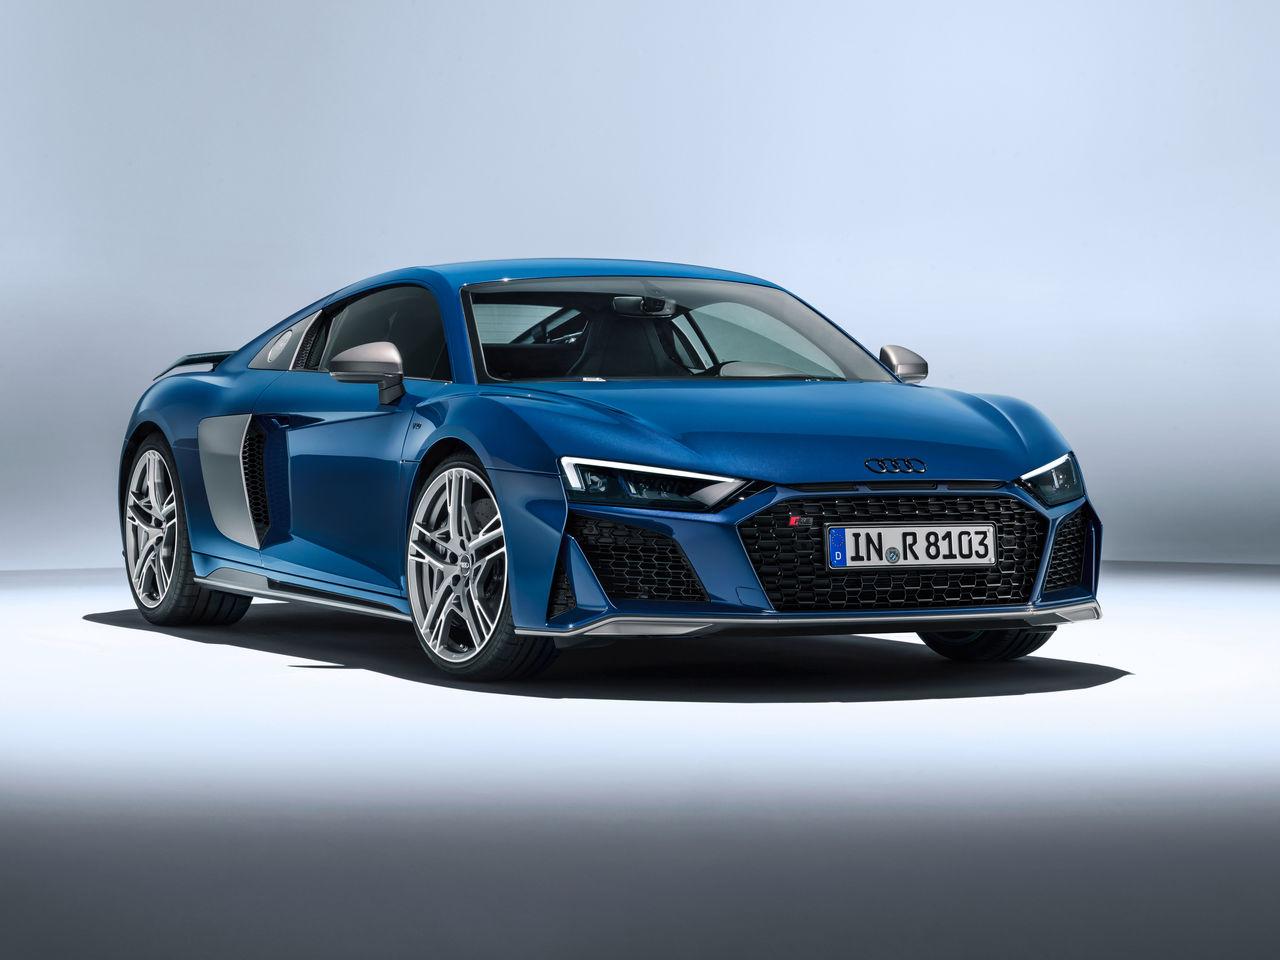 The New Audi R8 Audi Mediacenter